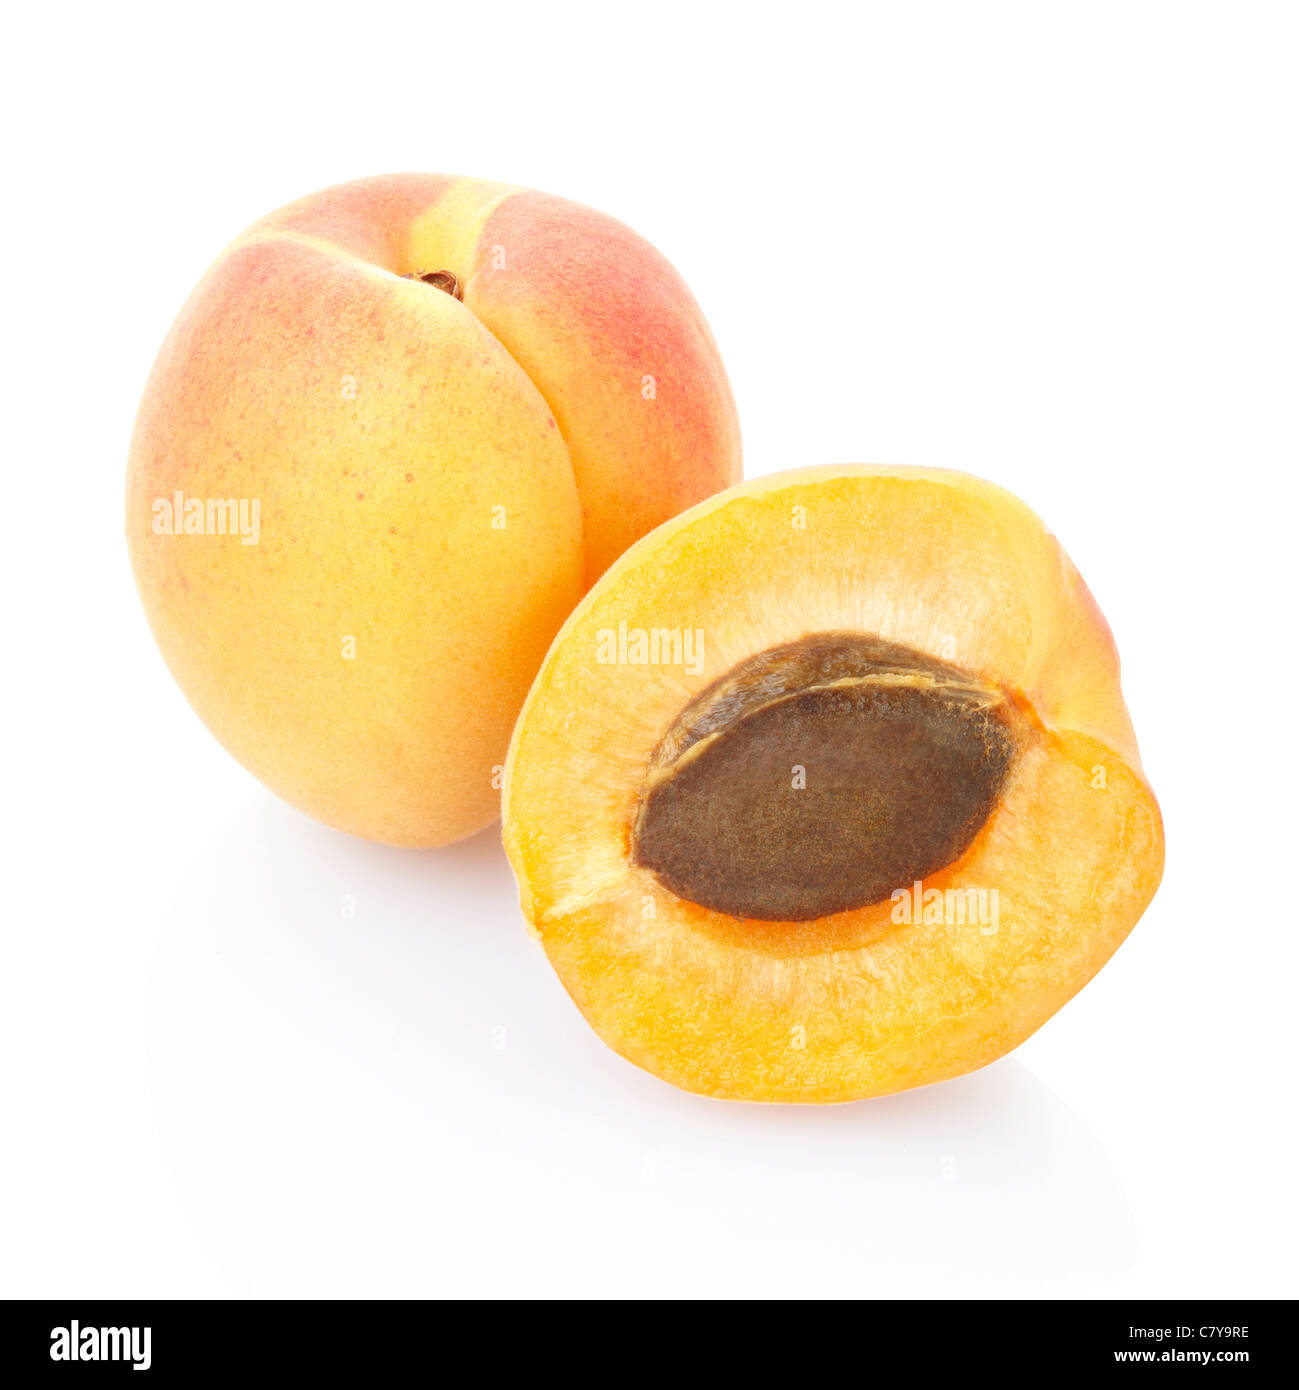 Apricot - Stock Image